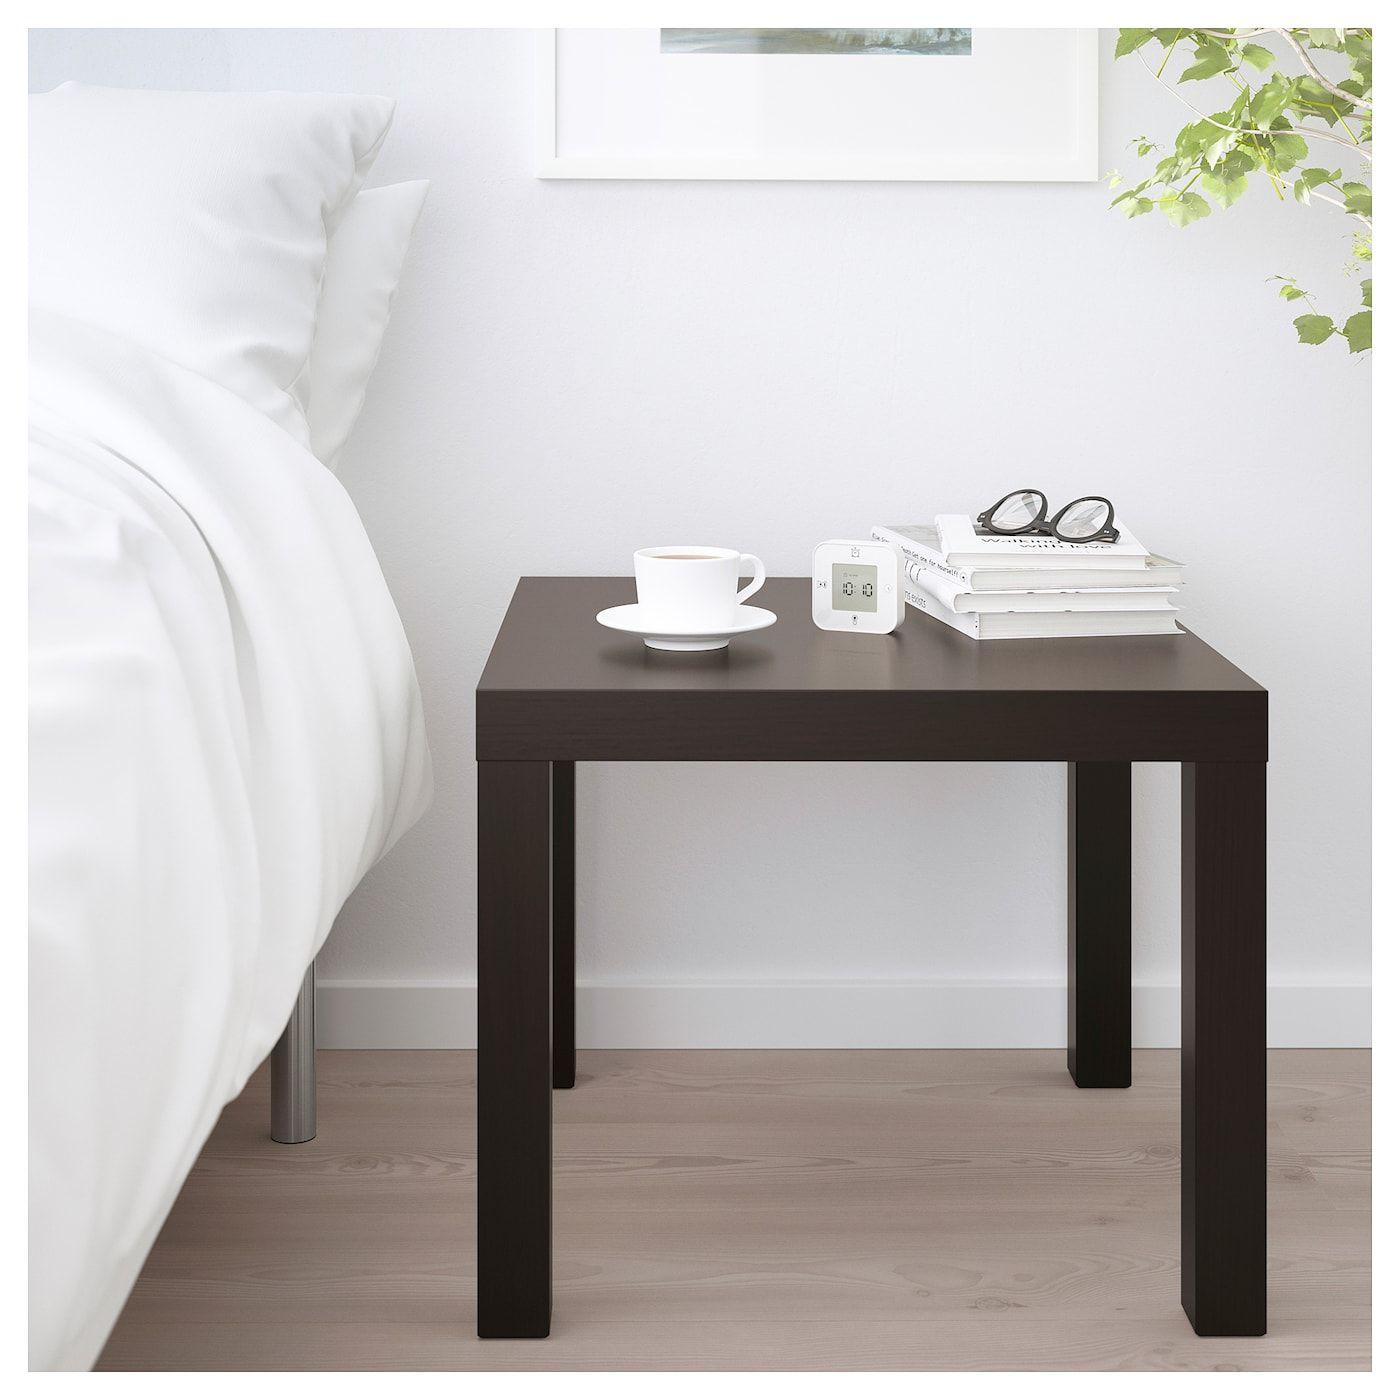 SMALL SIDE// COFFEE TABLE BLACK-BROWN IKEA